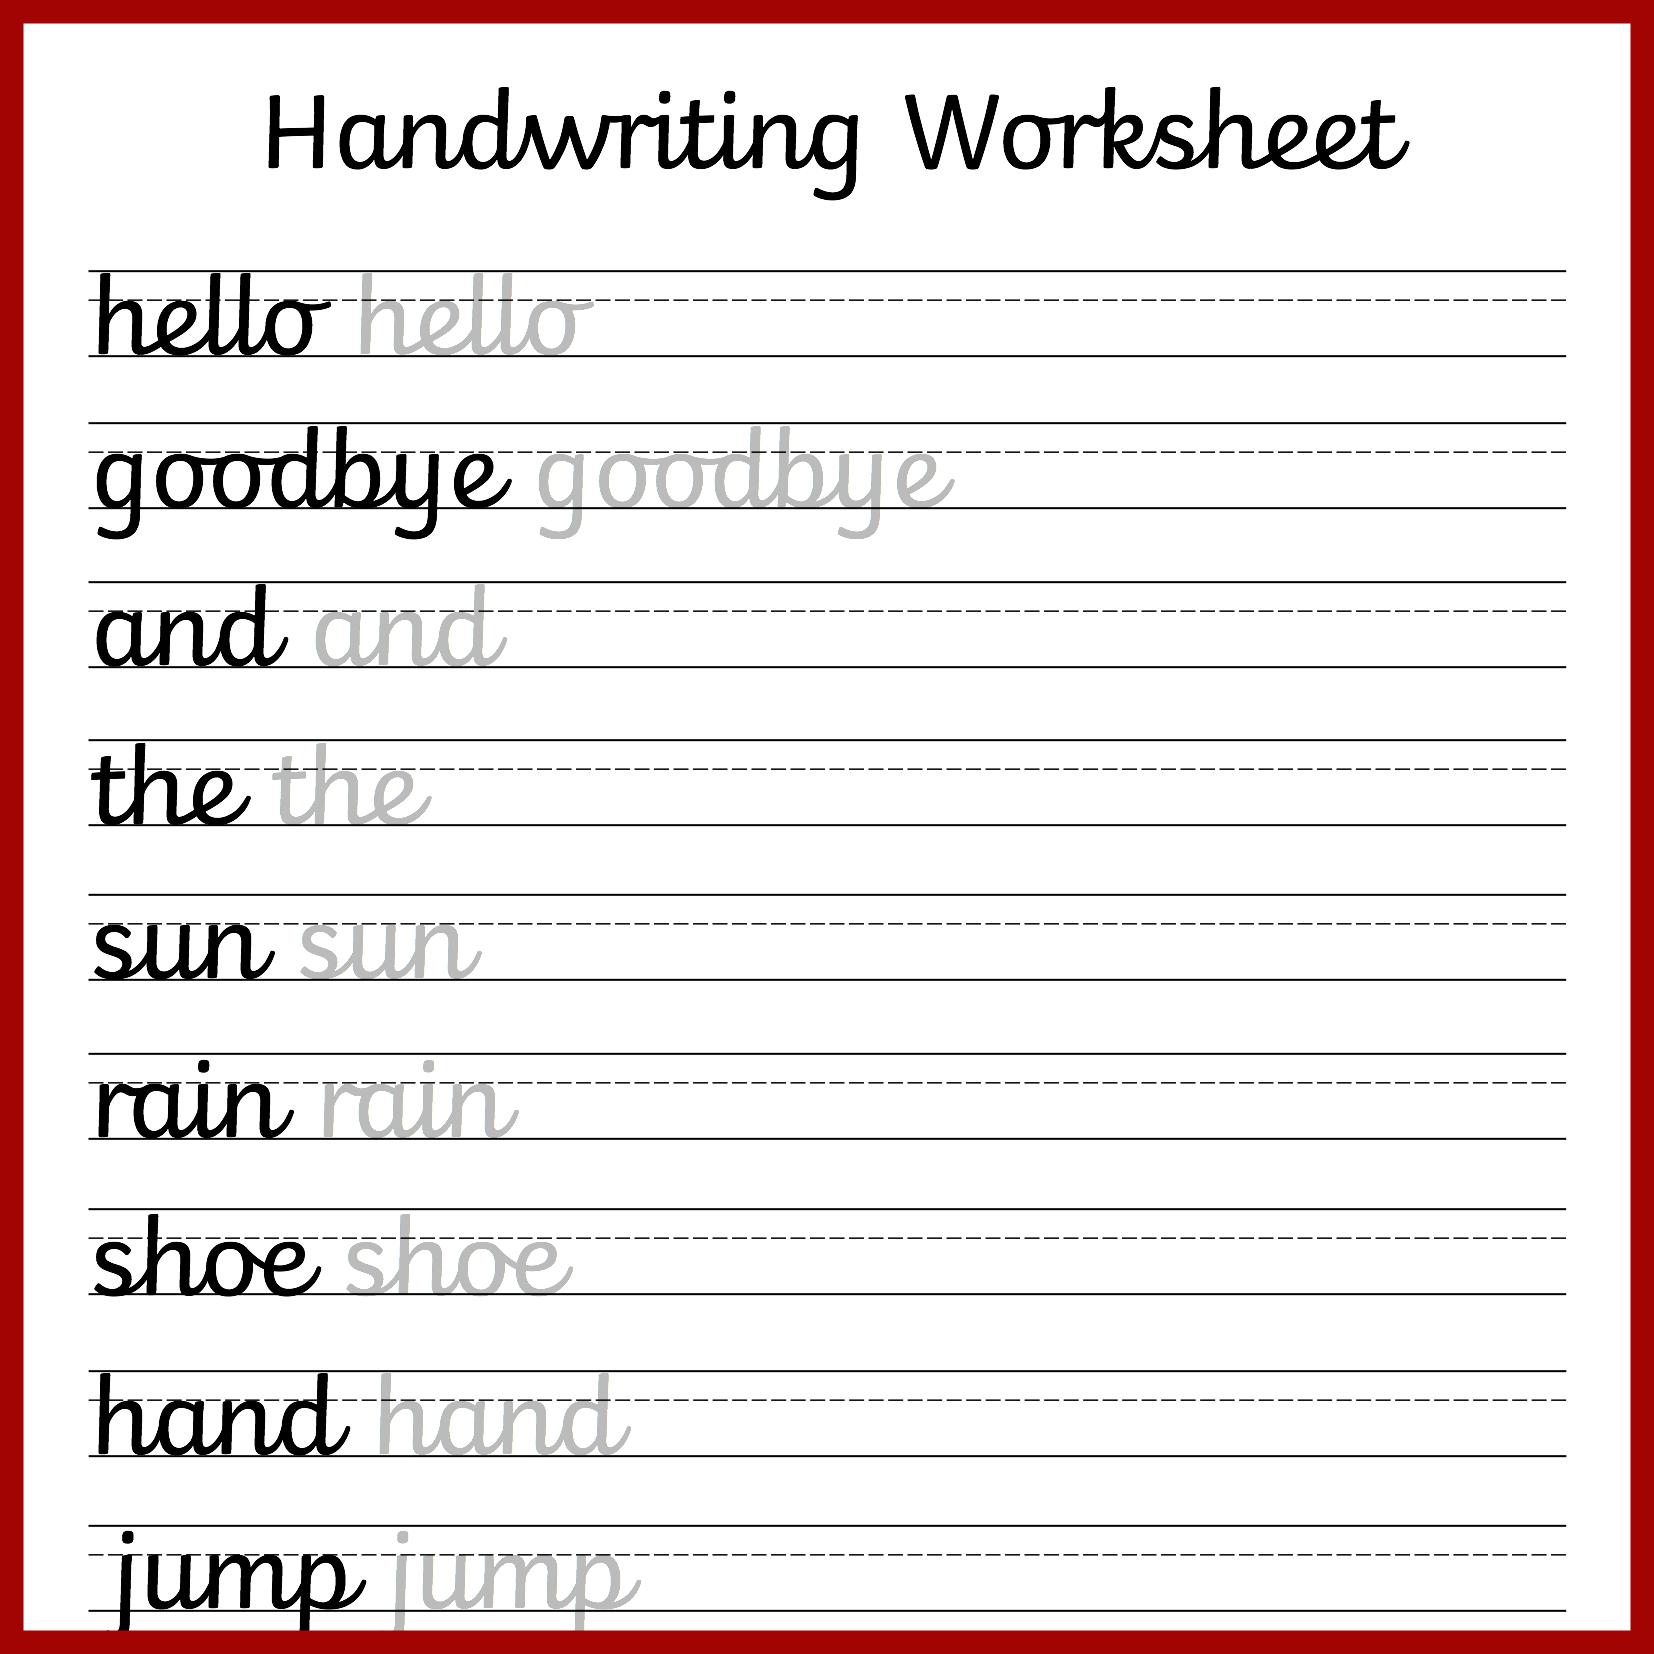 Cursive Handwriting Worksheets – Free Printable! ⋆ Mama Geek - Blank Handwriting Worksheets Printable Free